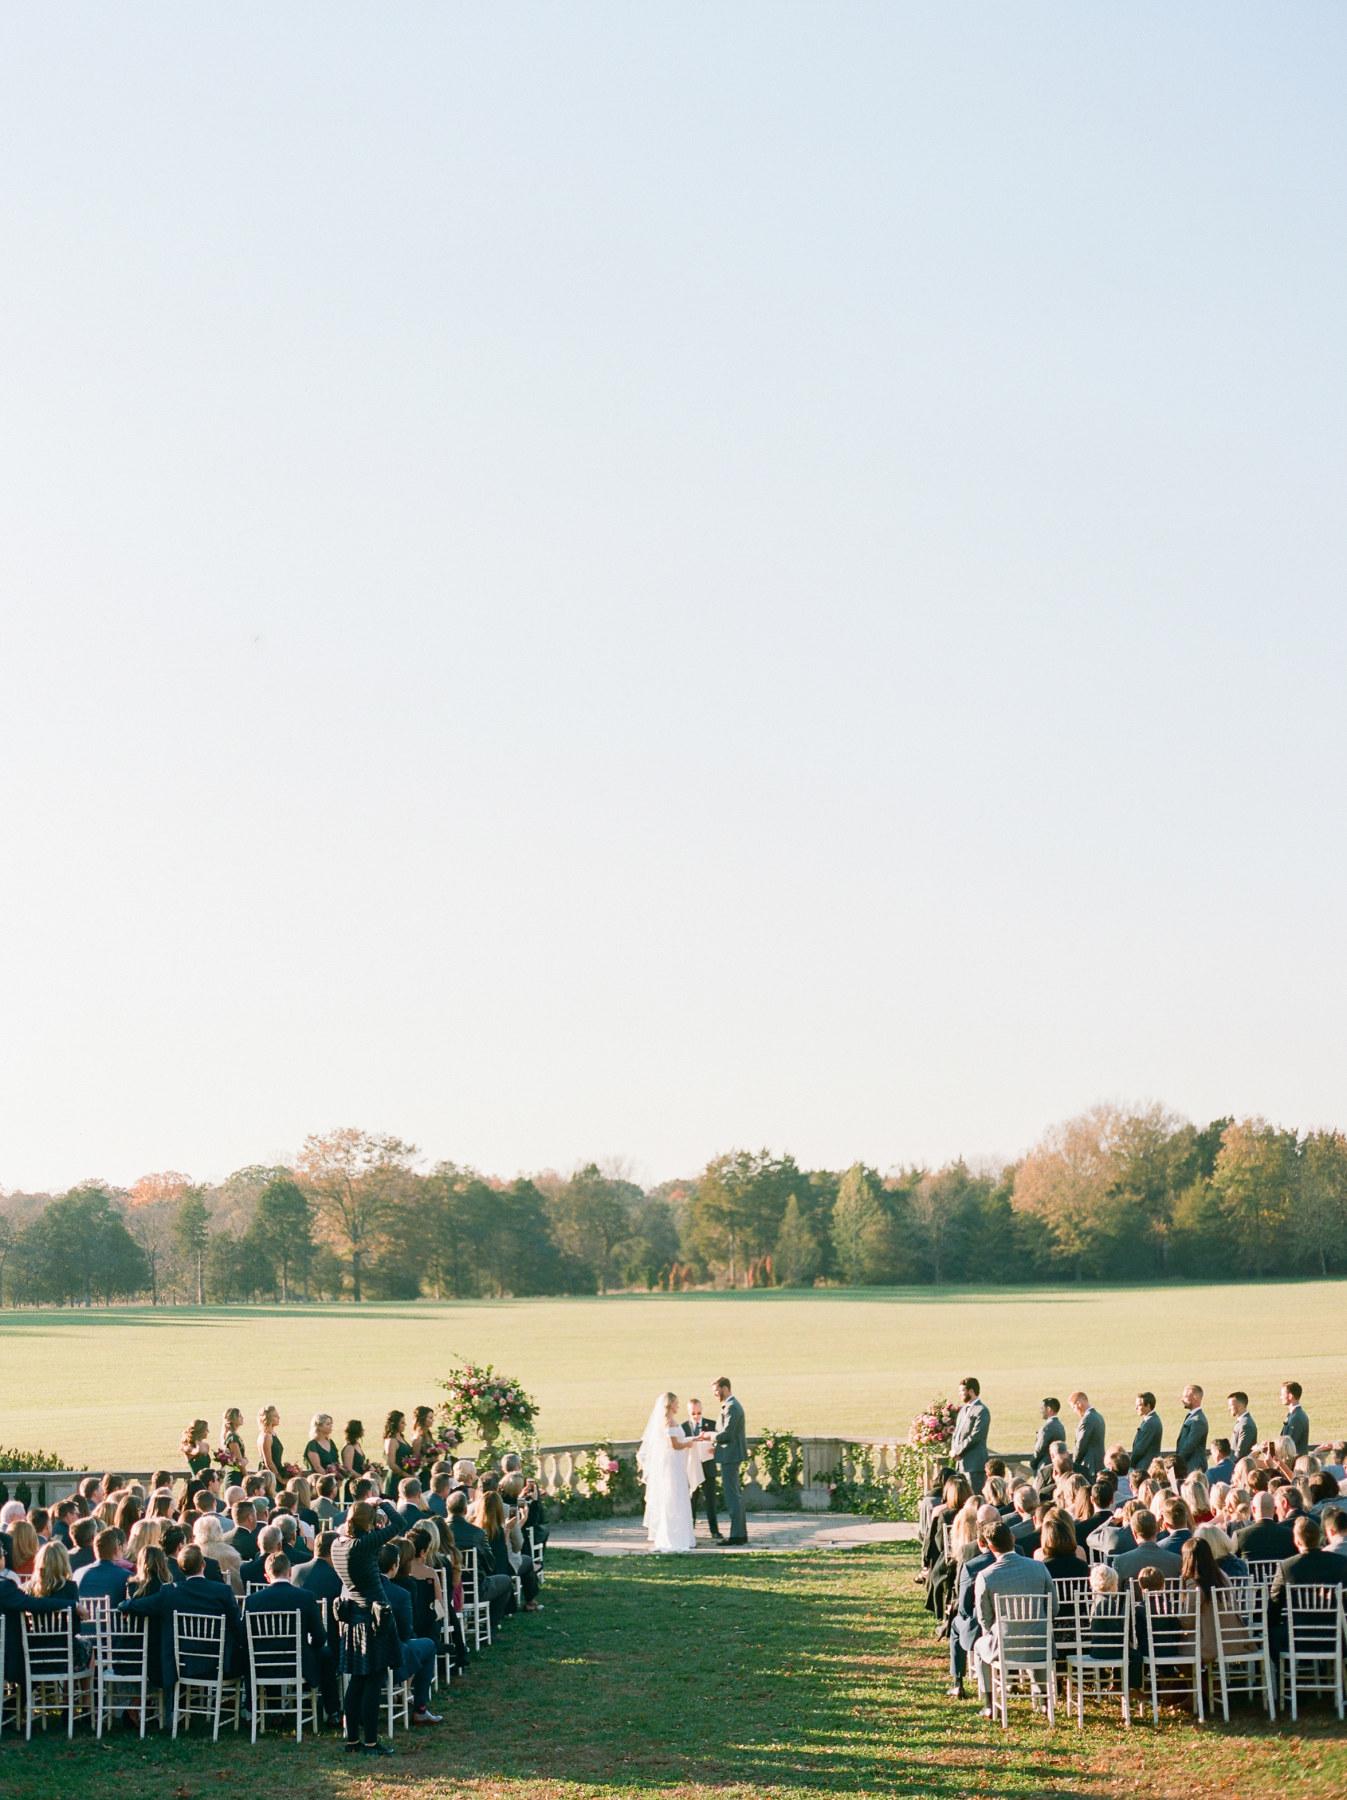 26Great_Marsh_Estates_Wedding_Anne_Kelley_Events_Astrid_Photography146486100015-2